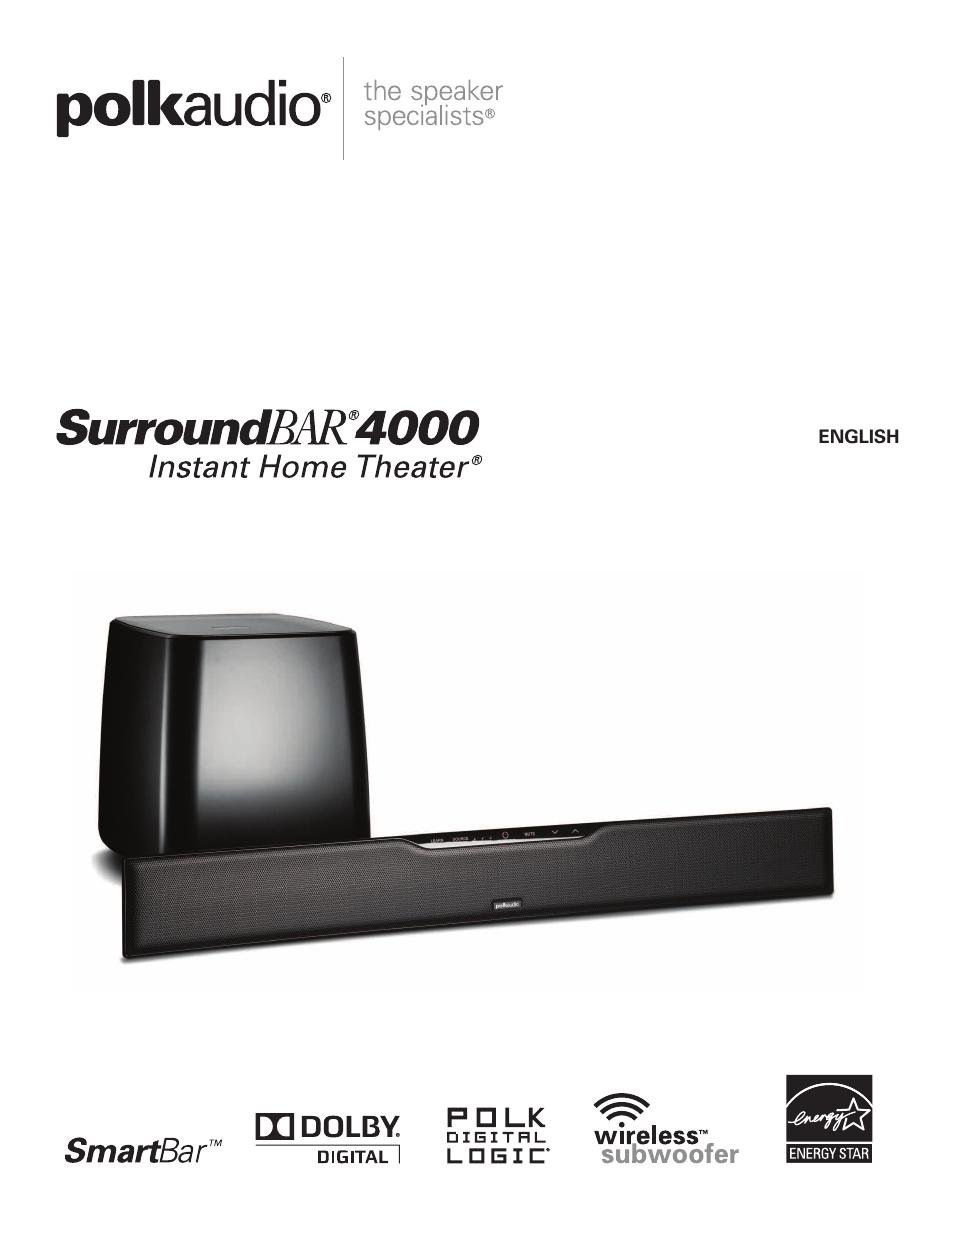 polk audio surroundbar 4000 user manual 12 pages rh manualsdir com polk audio surroundbar 6500bt manual polk audio surroundbar 6500bt manual